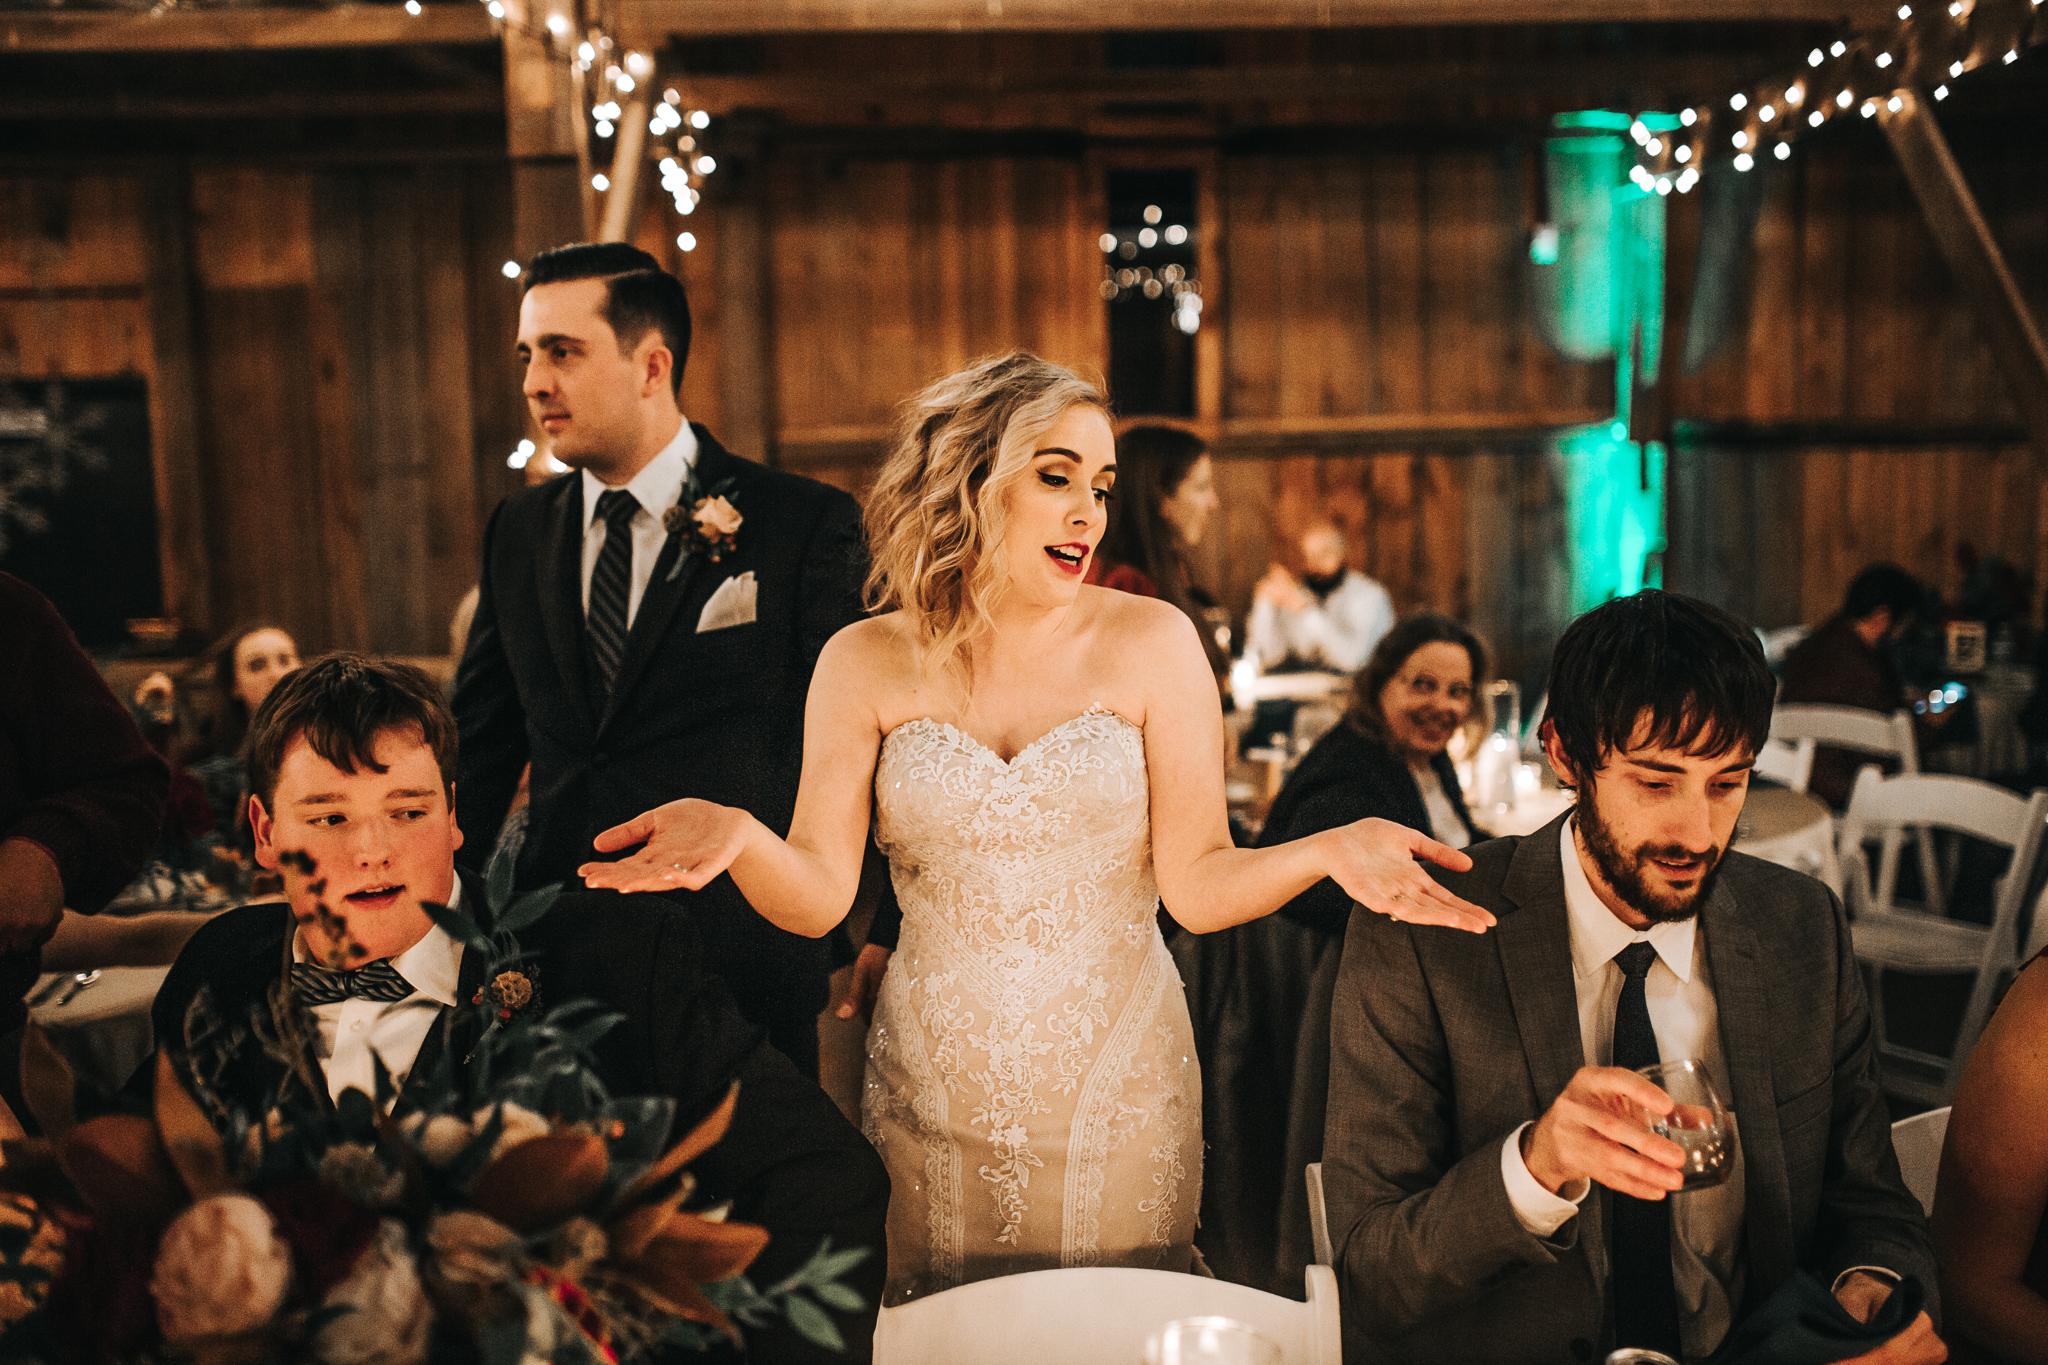 0152 Ariana Jordan Photo - Cameron & Lauren's Wedding at Talon Winery  7500.jpg